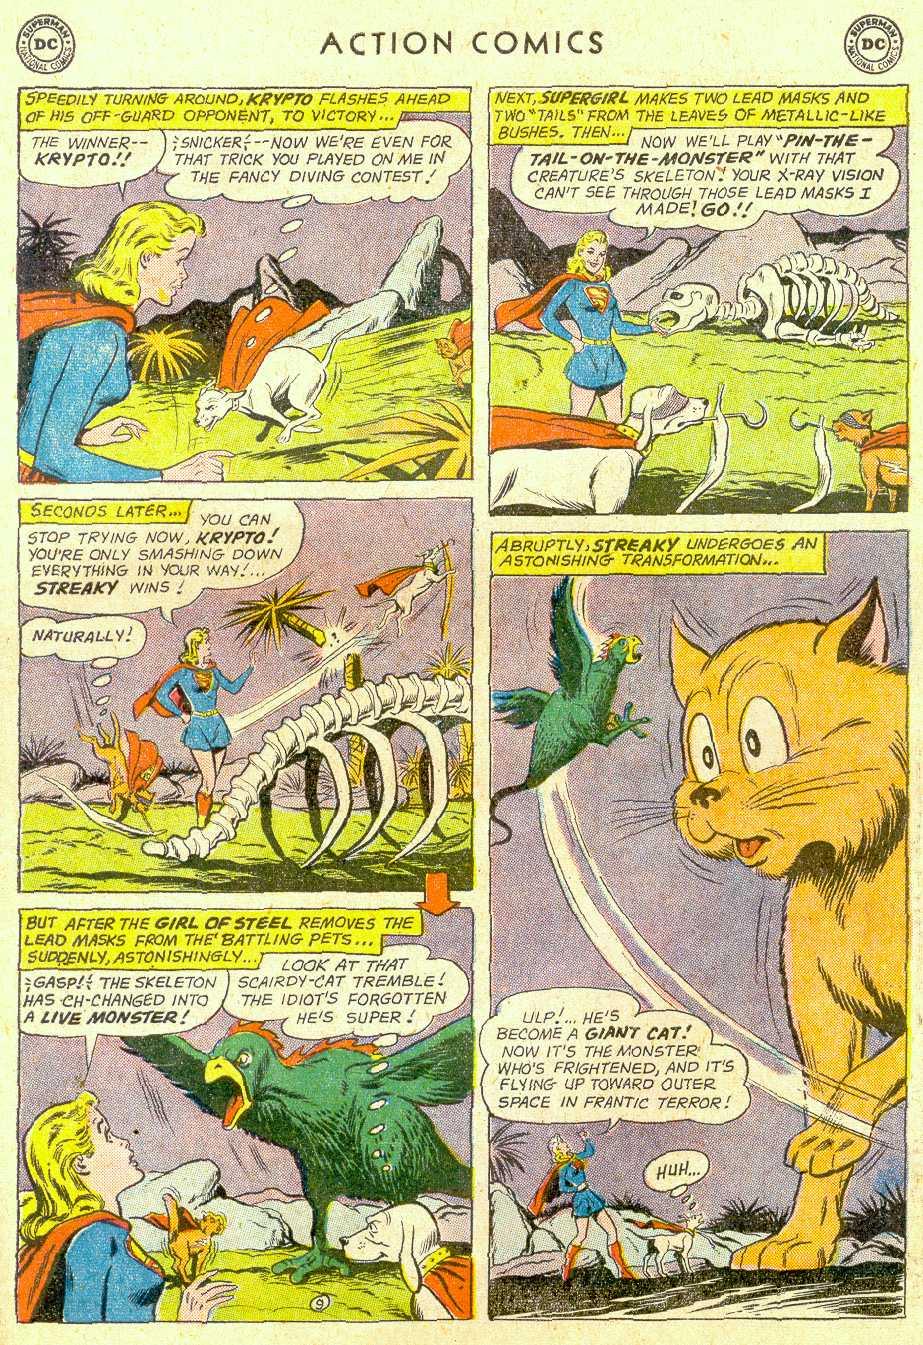 Action Comics (1938) 277 Page 26